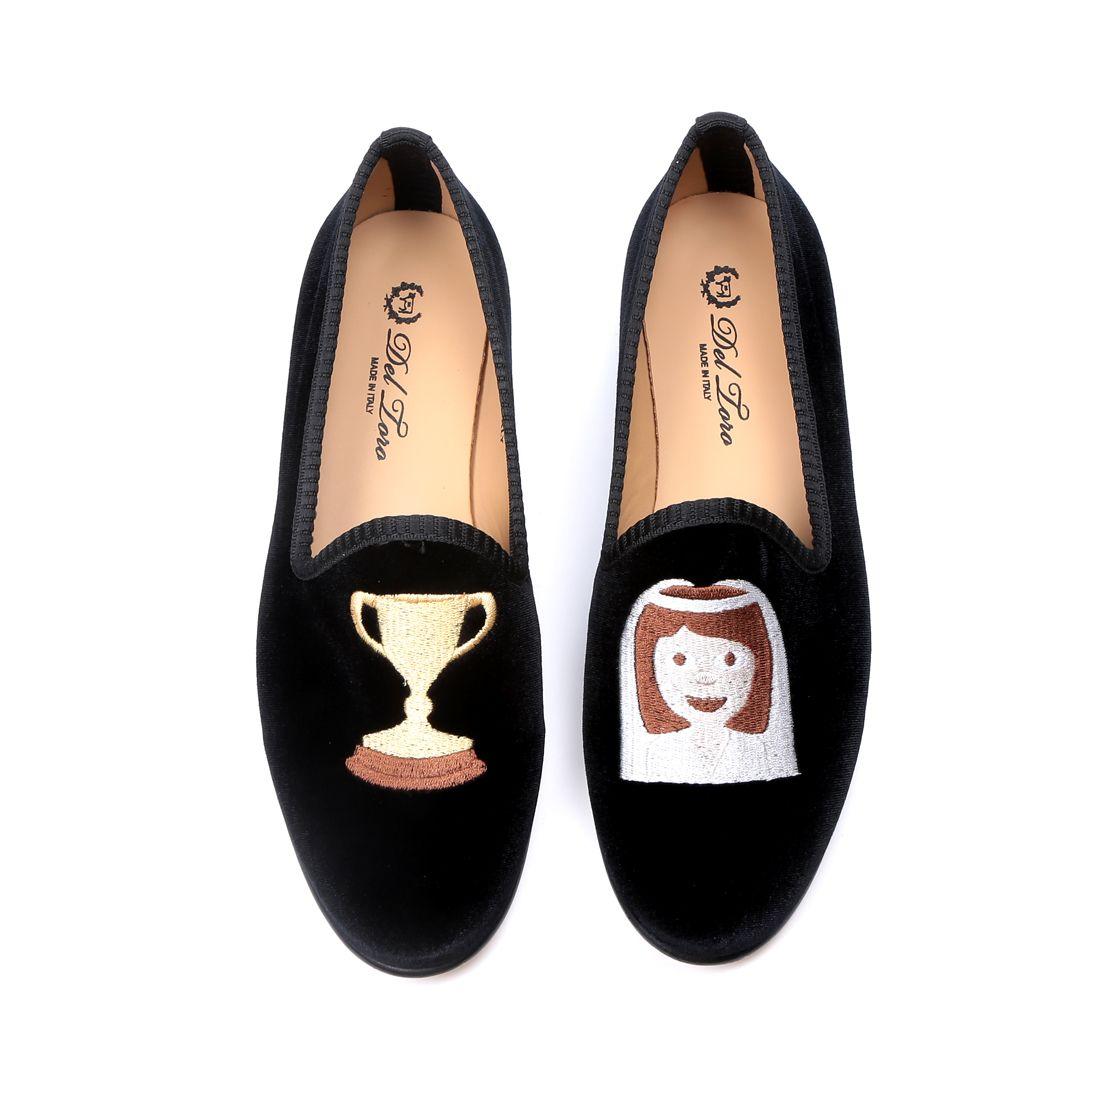 Women's Black Velvet Slipper With #TrophyWife Embroidery - Del Toro Shoes